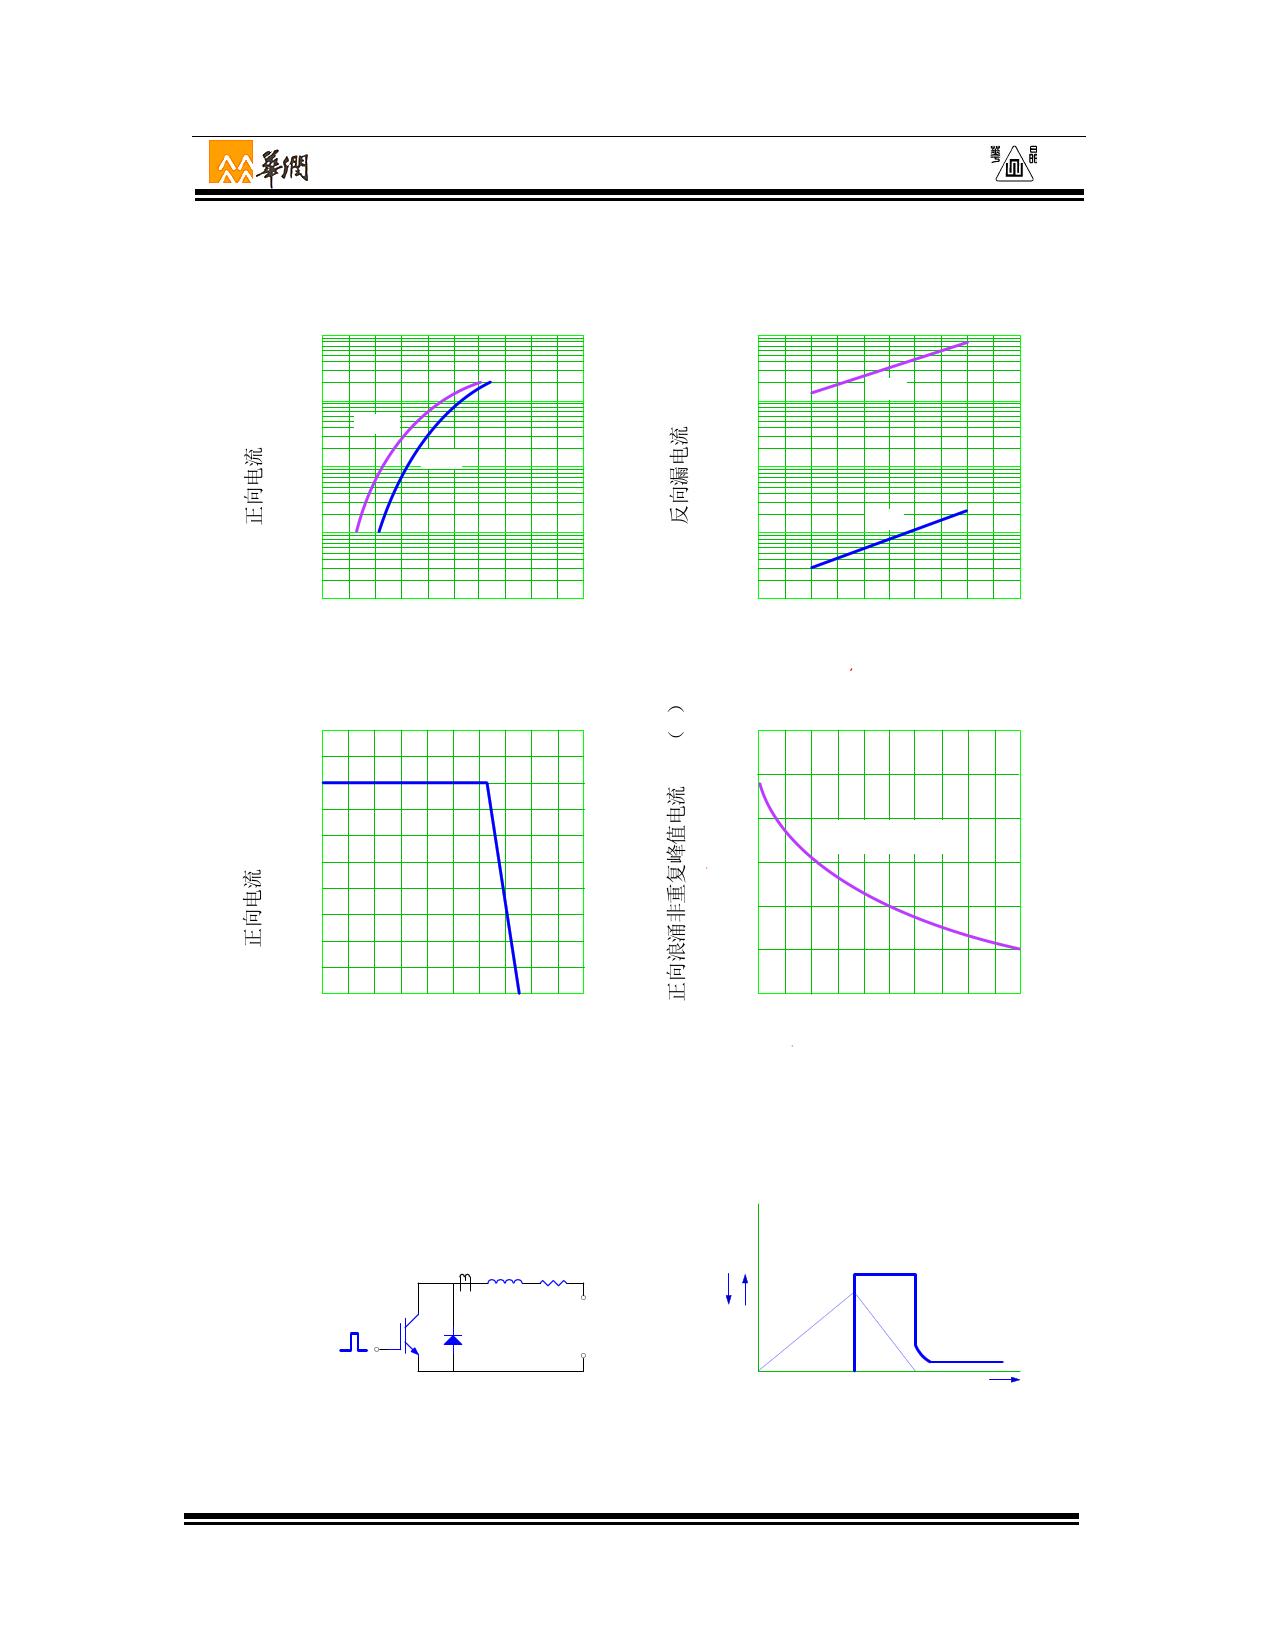 2CR162A8S pdf, ピン配列